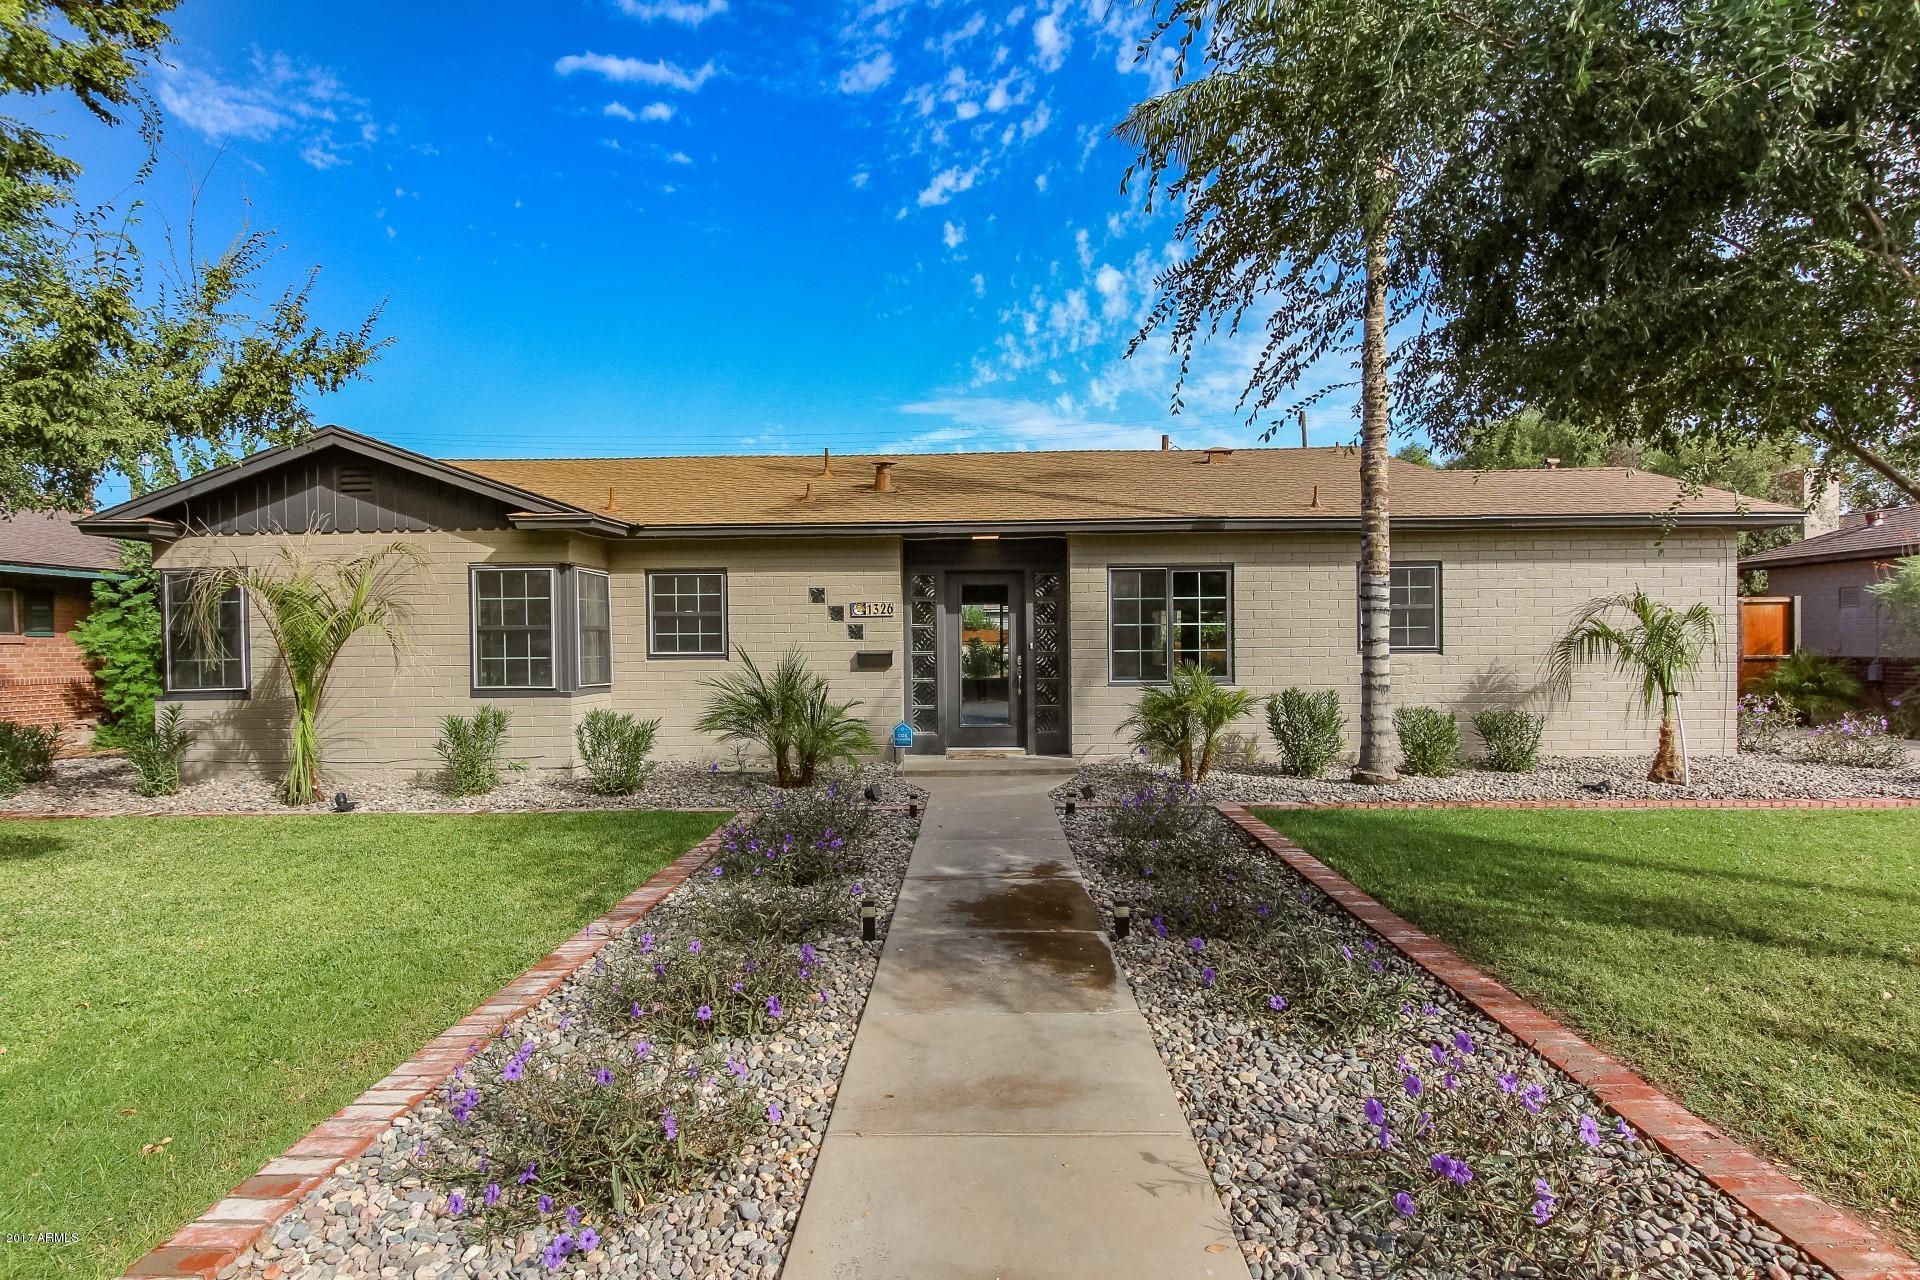 1326 W EDGEMONT Avenue, Phoenix, AZ 85007